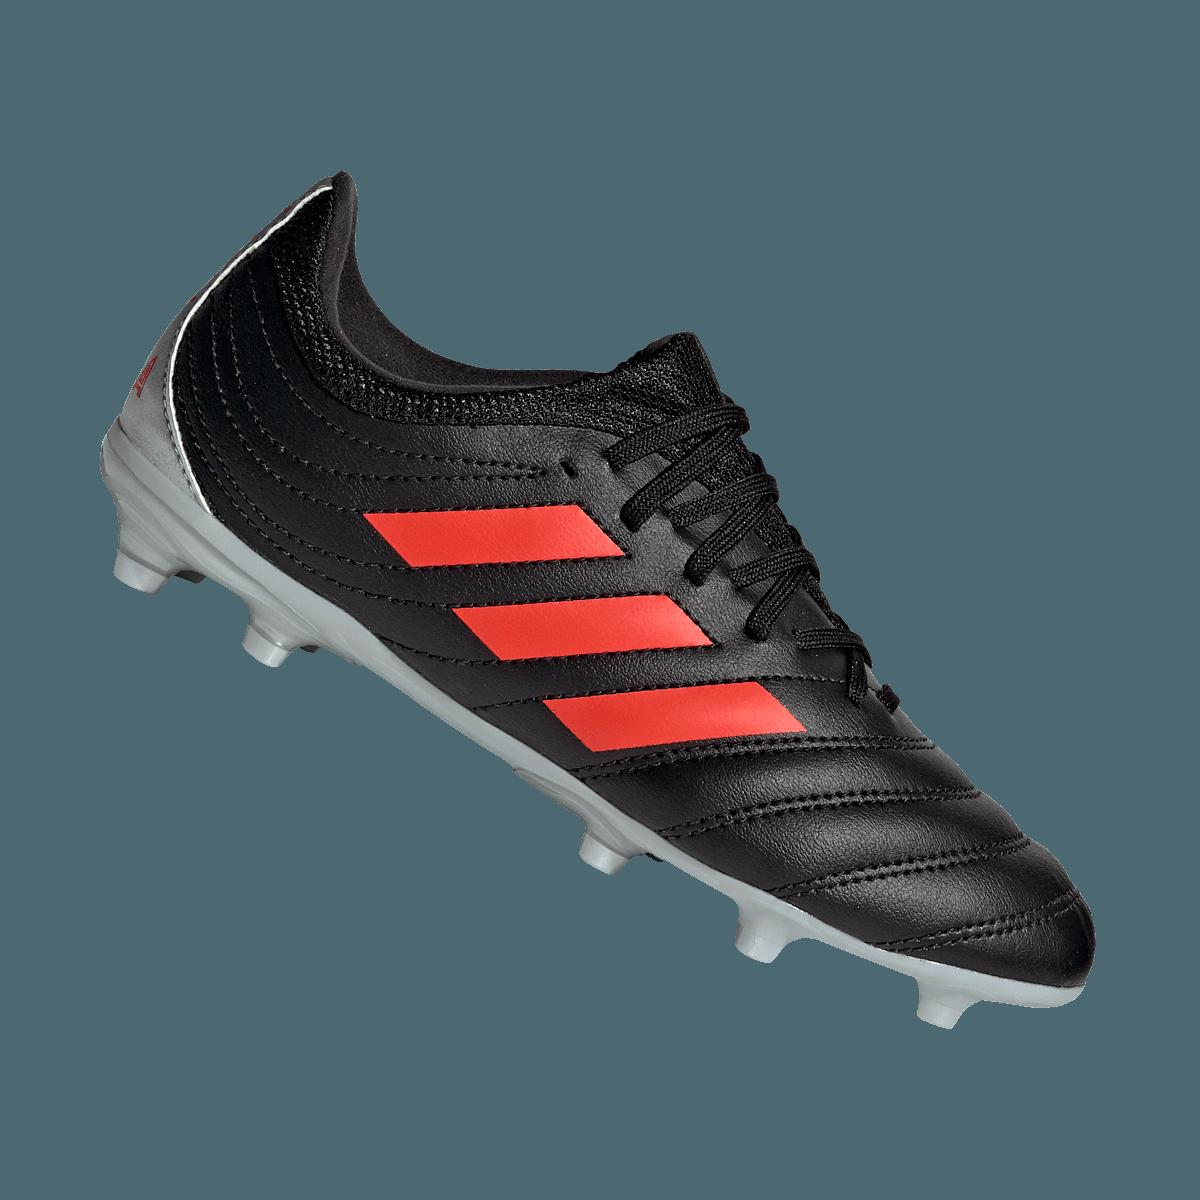 adidas Kinder Fußballschuh Copa 19.3 FG J schwarzrot